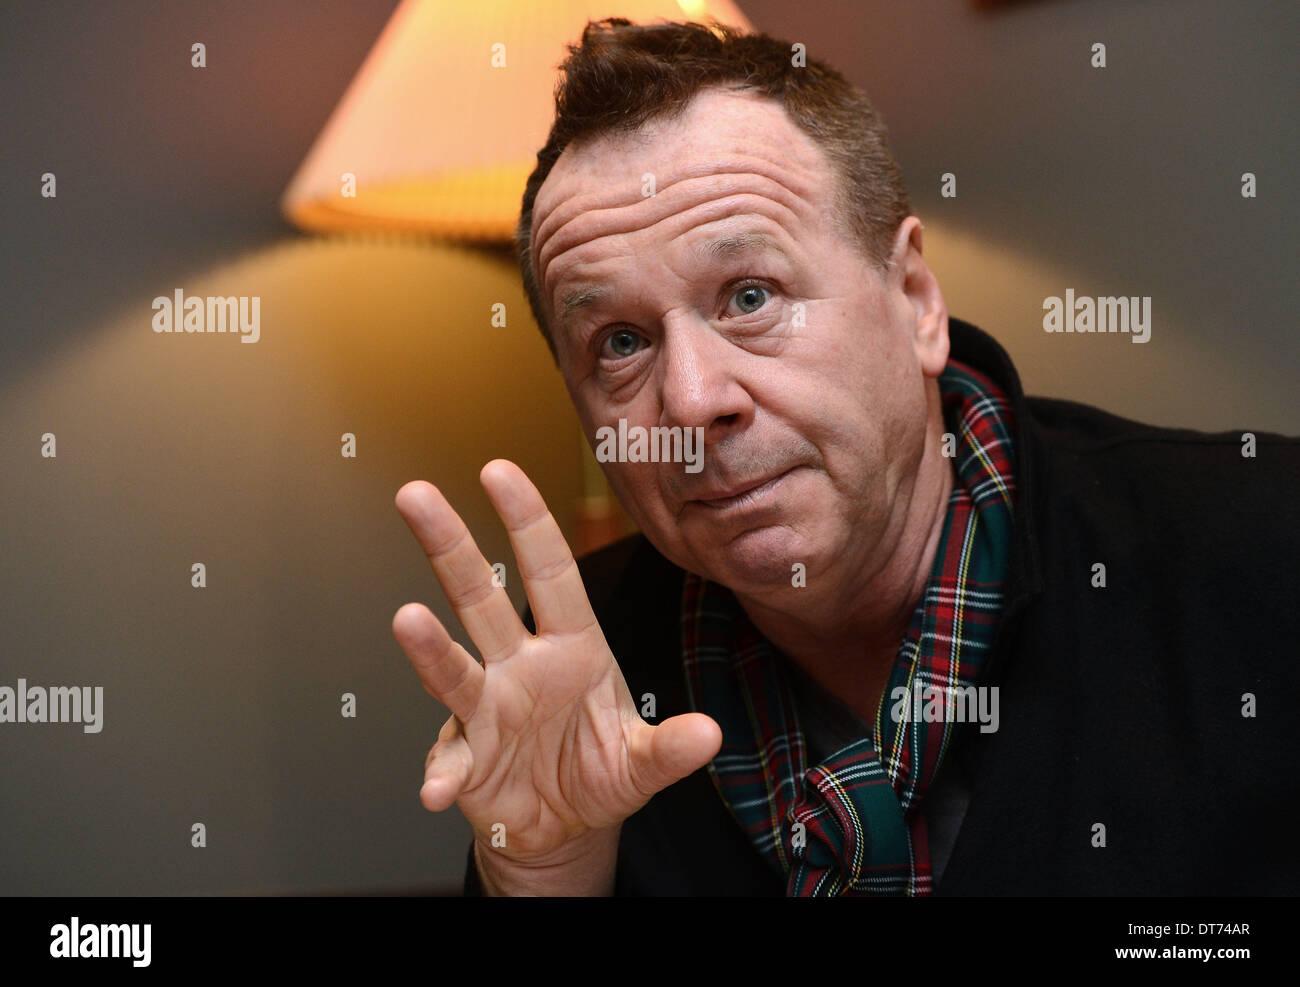 Prague, Czech Republic. 10th February 2014. Simple Minds frontman Jim Kerr is seen during a press conference in Prague, Czech Republic, on February 10, 2014. (CTK Photo/Katerina Sulova/Alamy Live News) - Stock Image